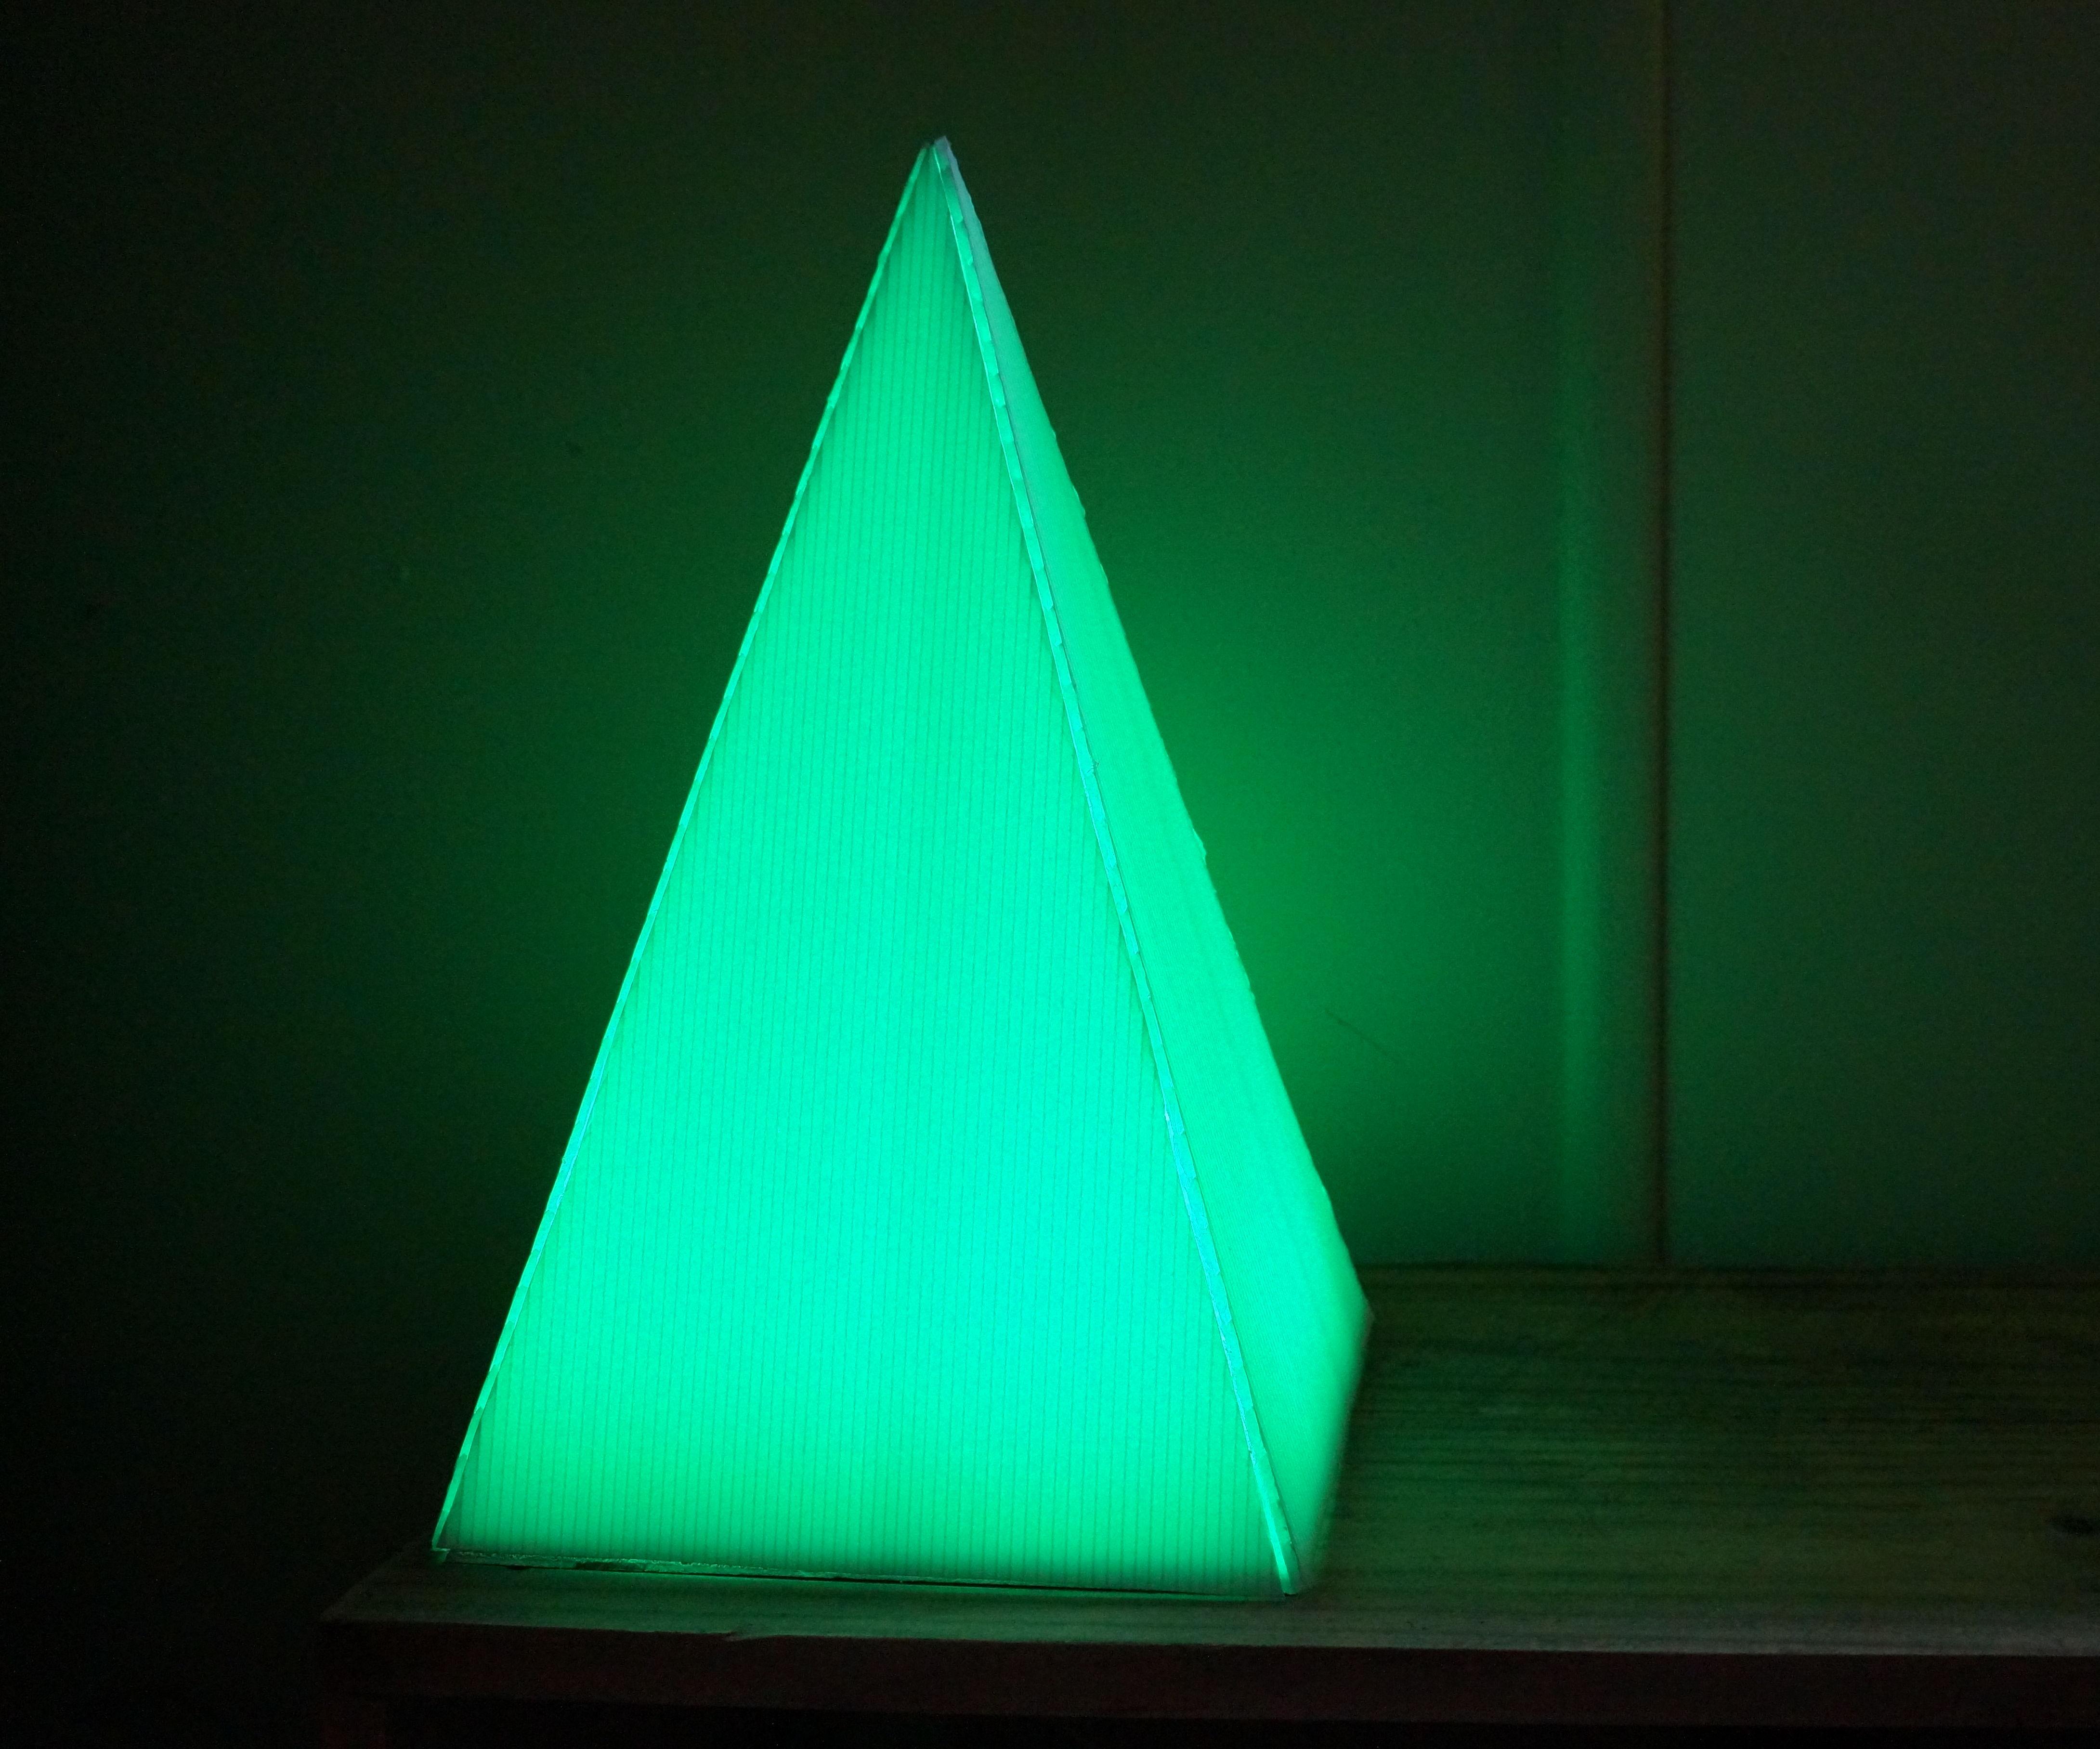 Spectrum - Geometric Pyramid of Light